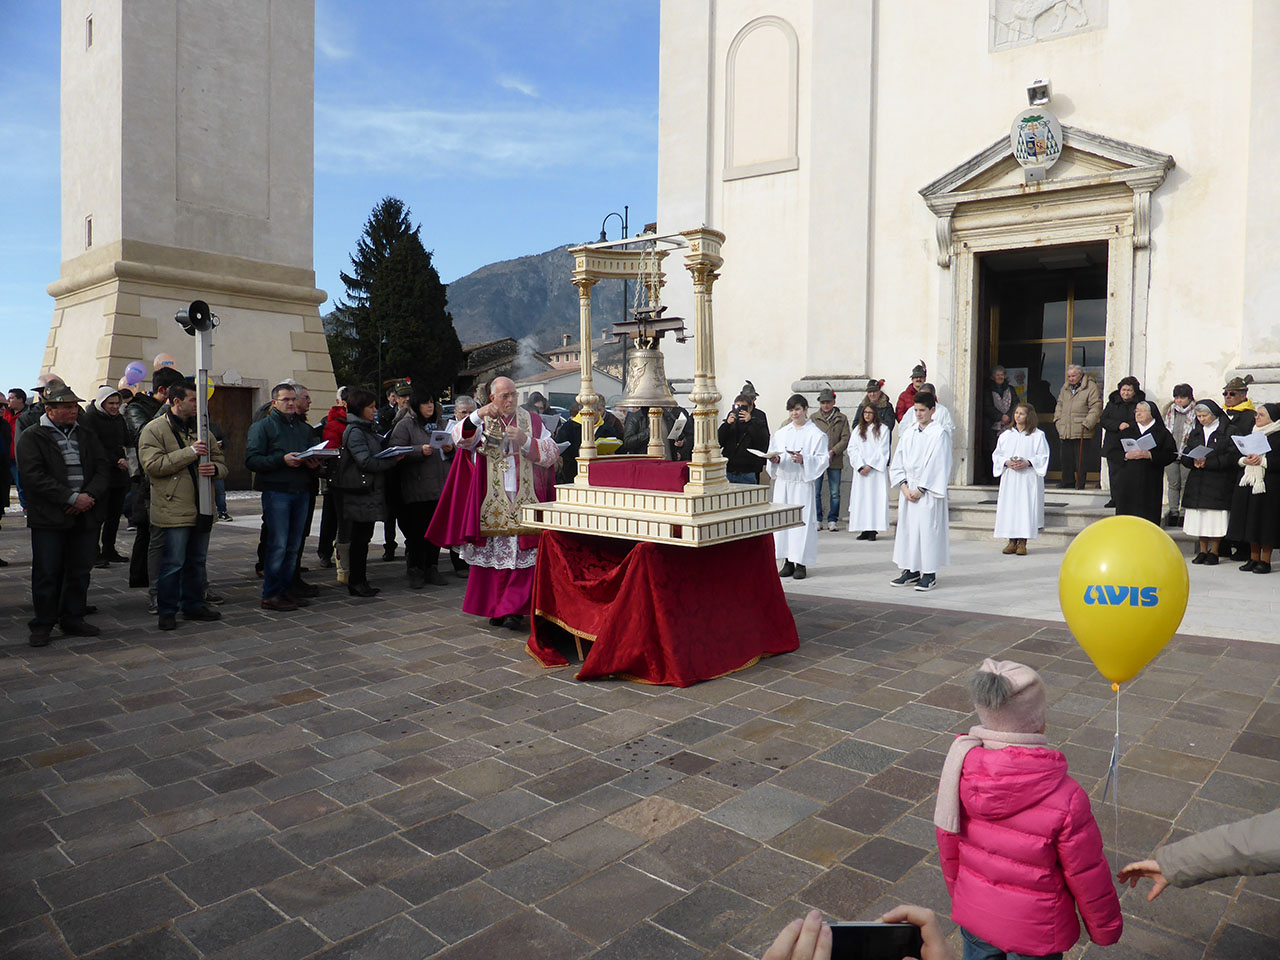 Mons. Liberio Andreatta